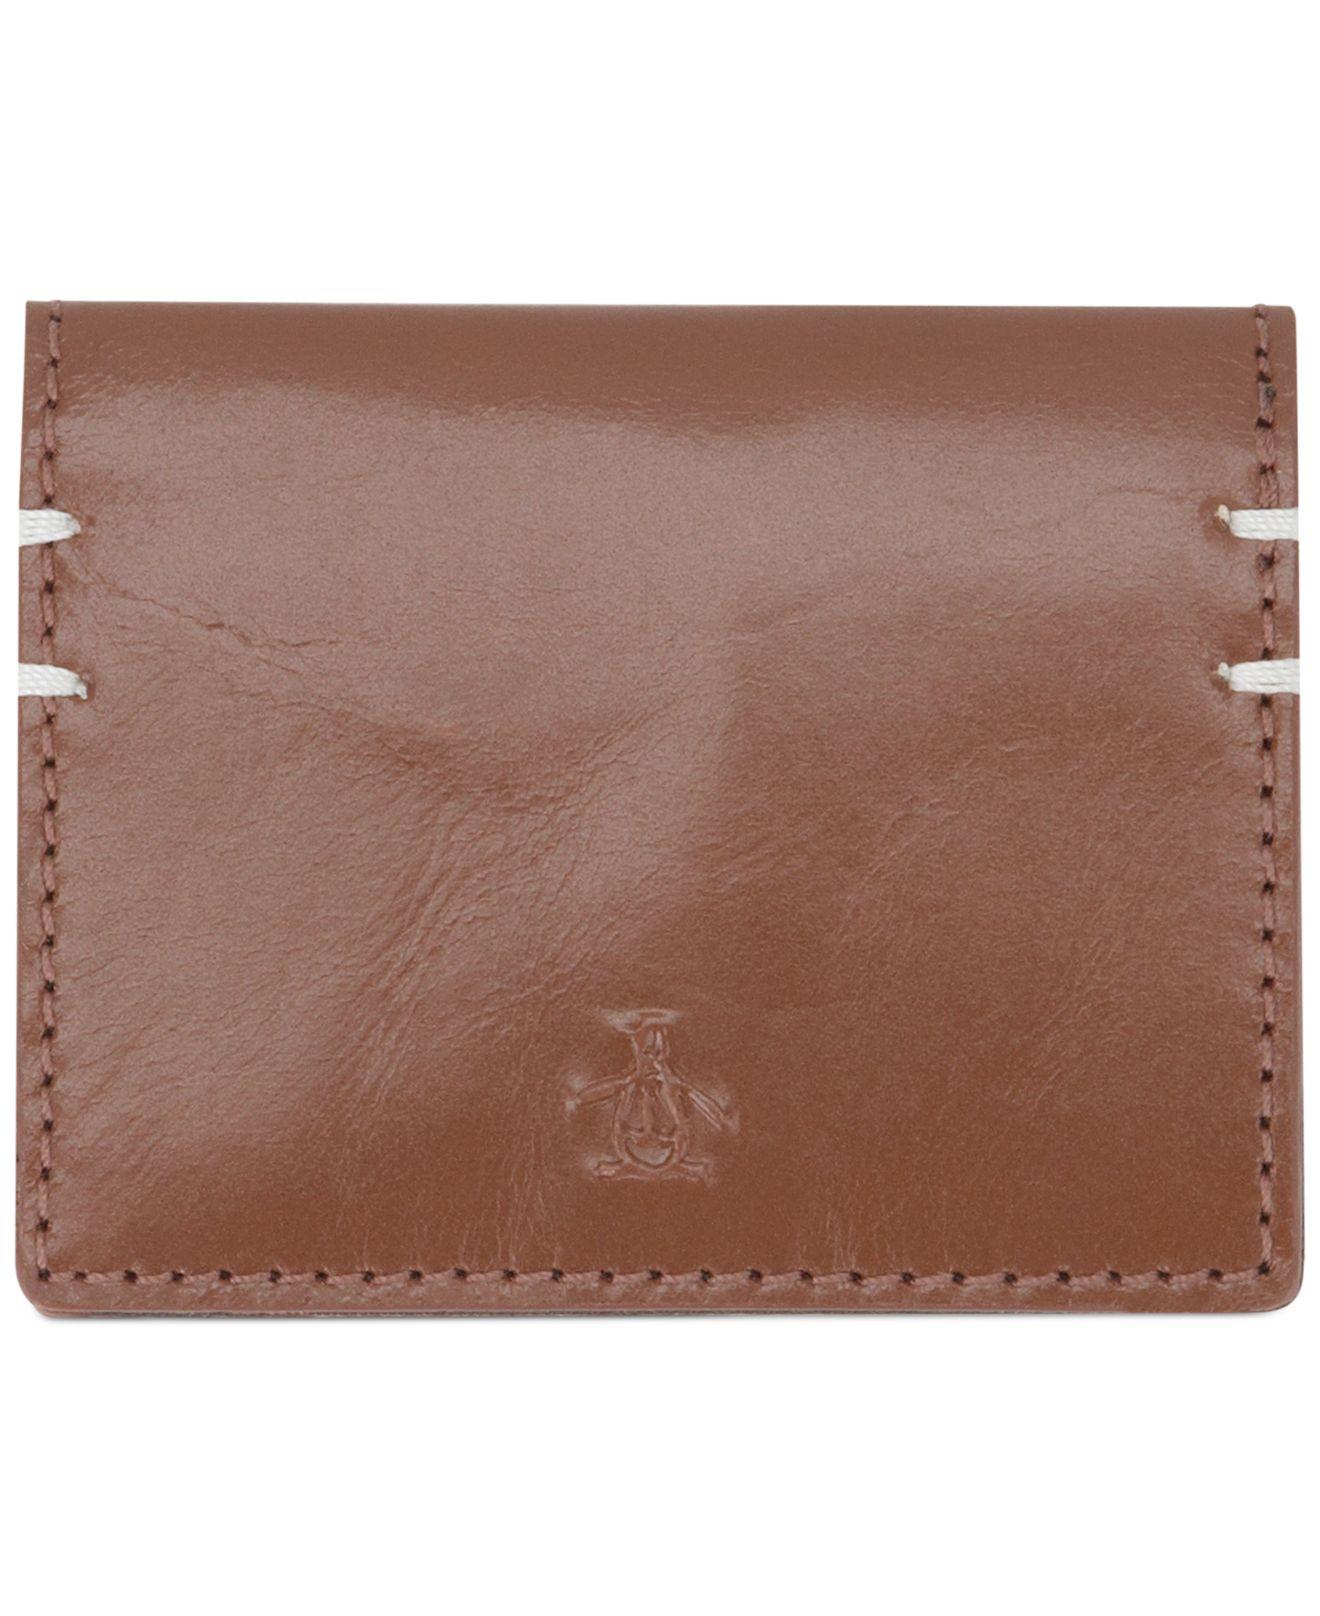 Lyst - Original Penguin Printed Business Card Wallet in Brown for Men